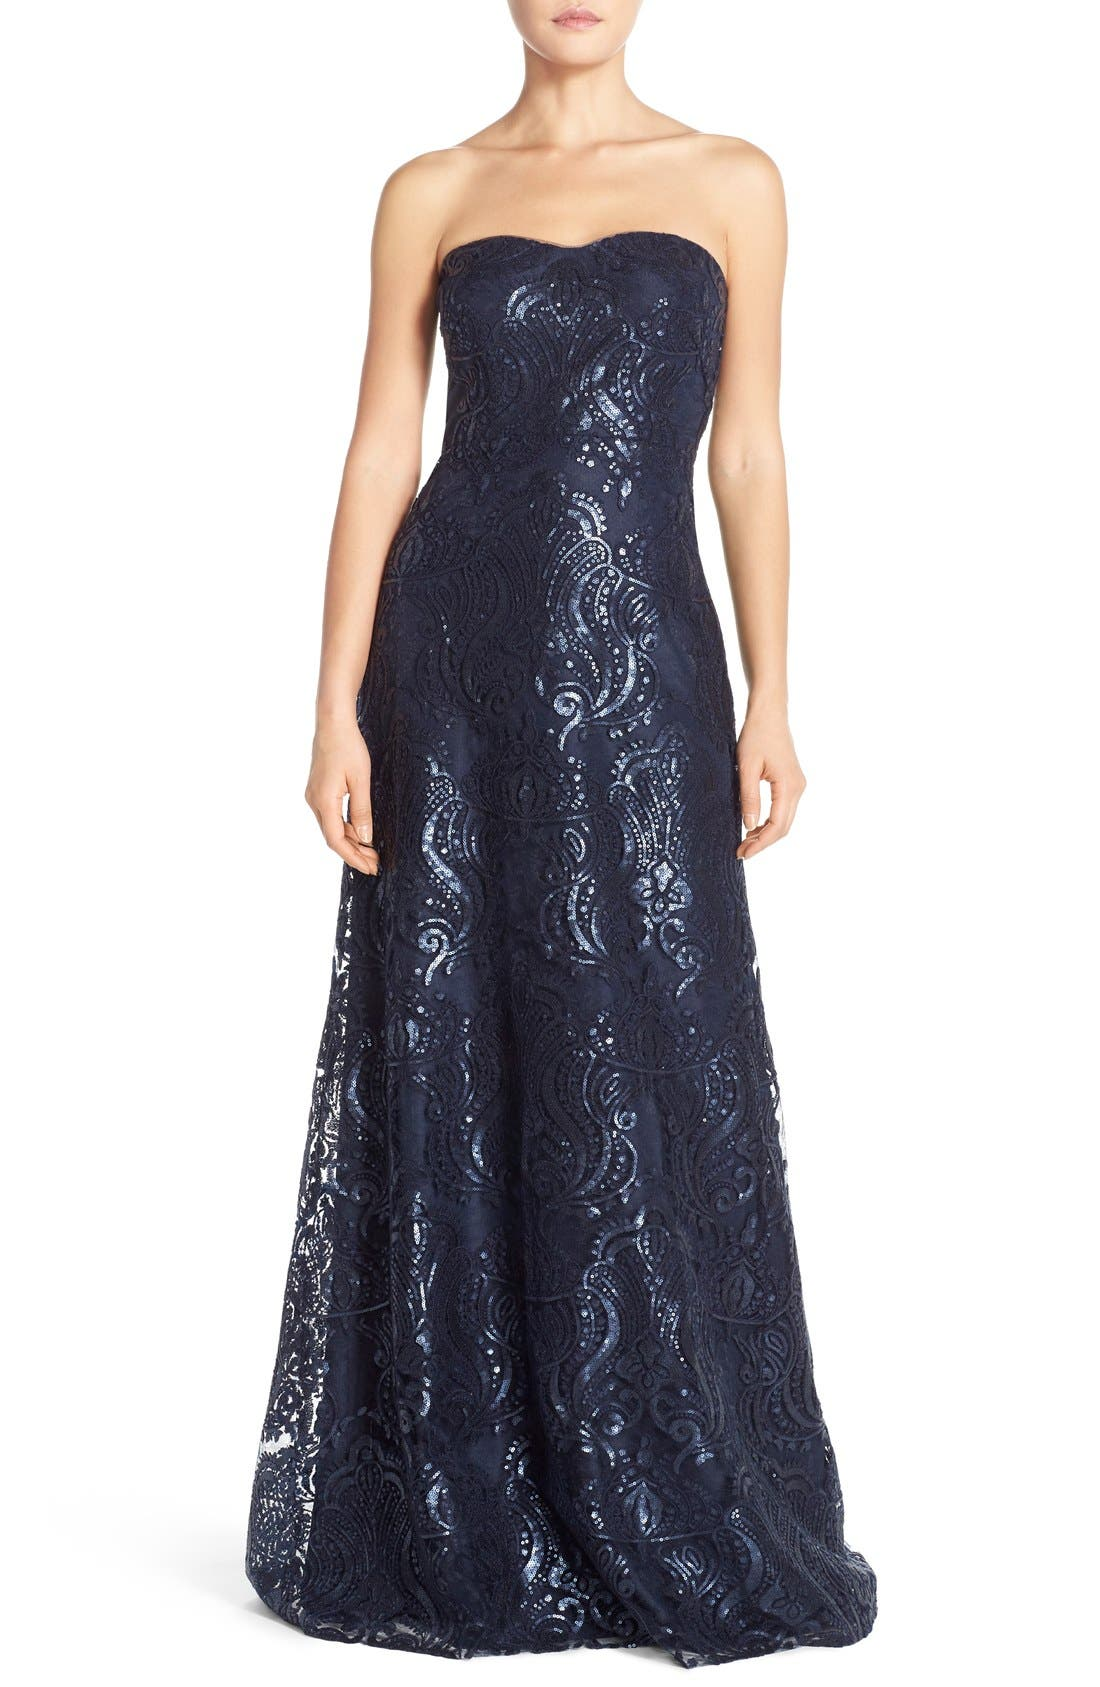 Sadie Sequin Lace Strapless A-Line Gown,                             Main thumbnail 1, color,                             410